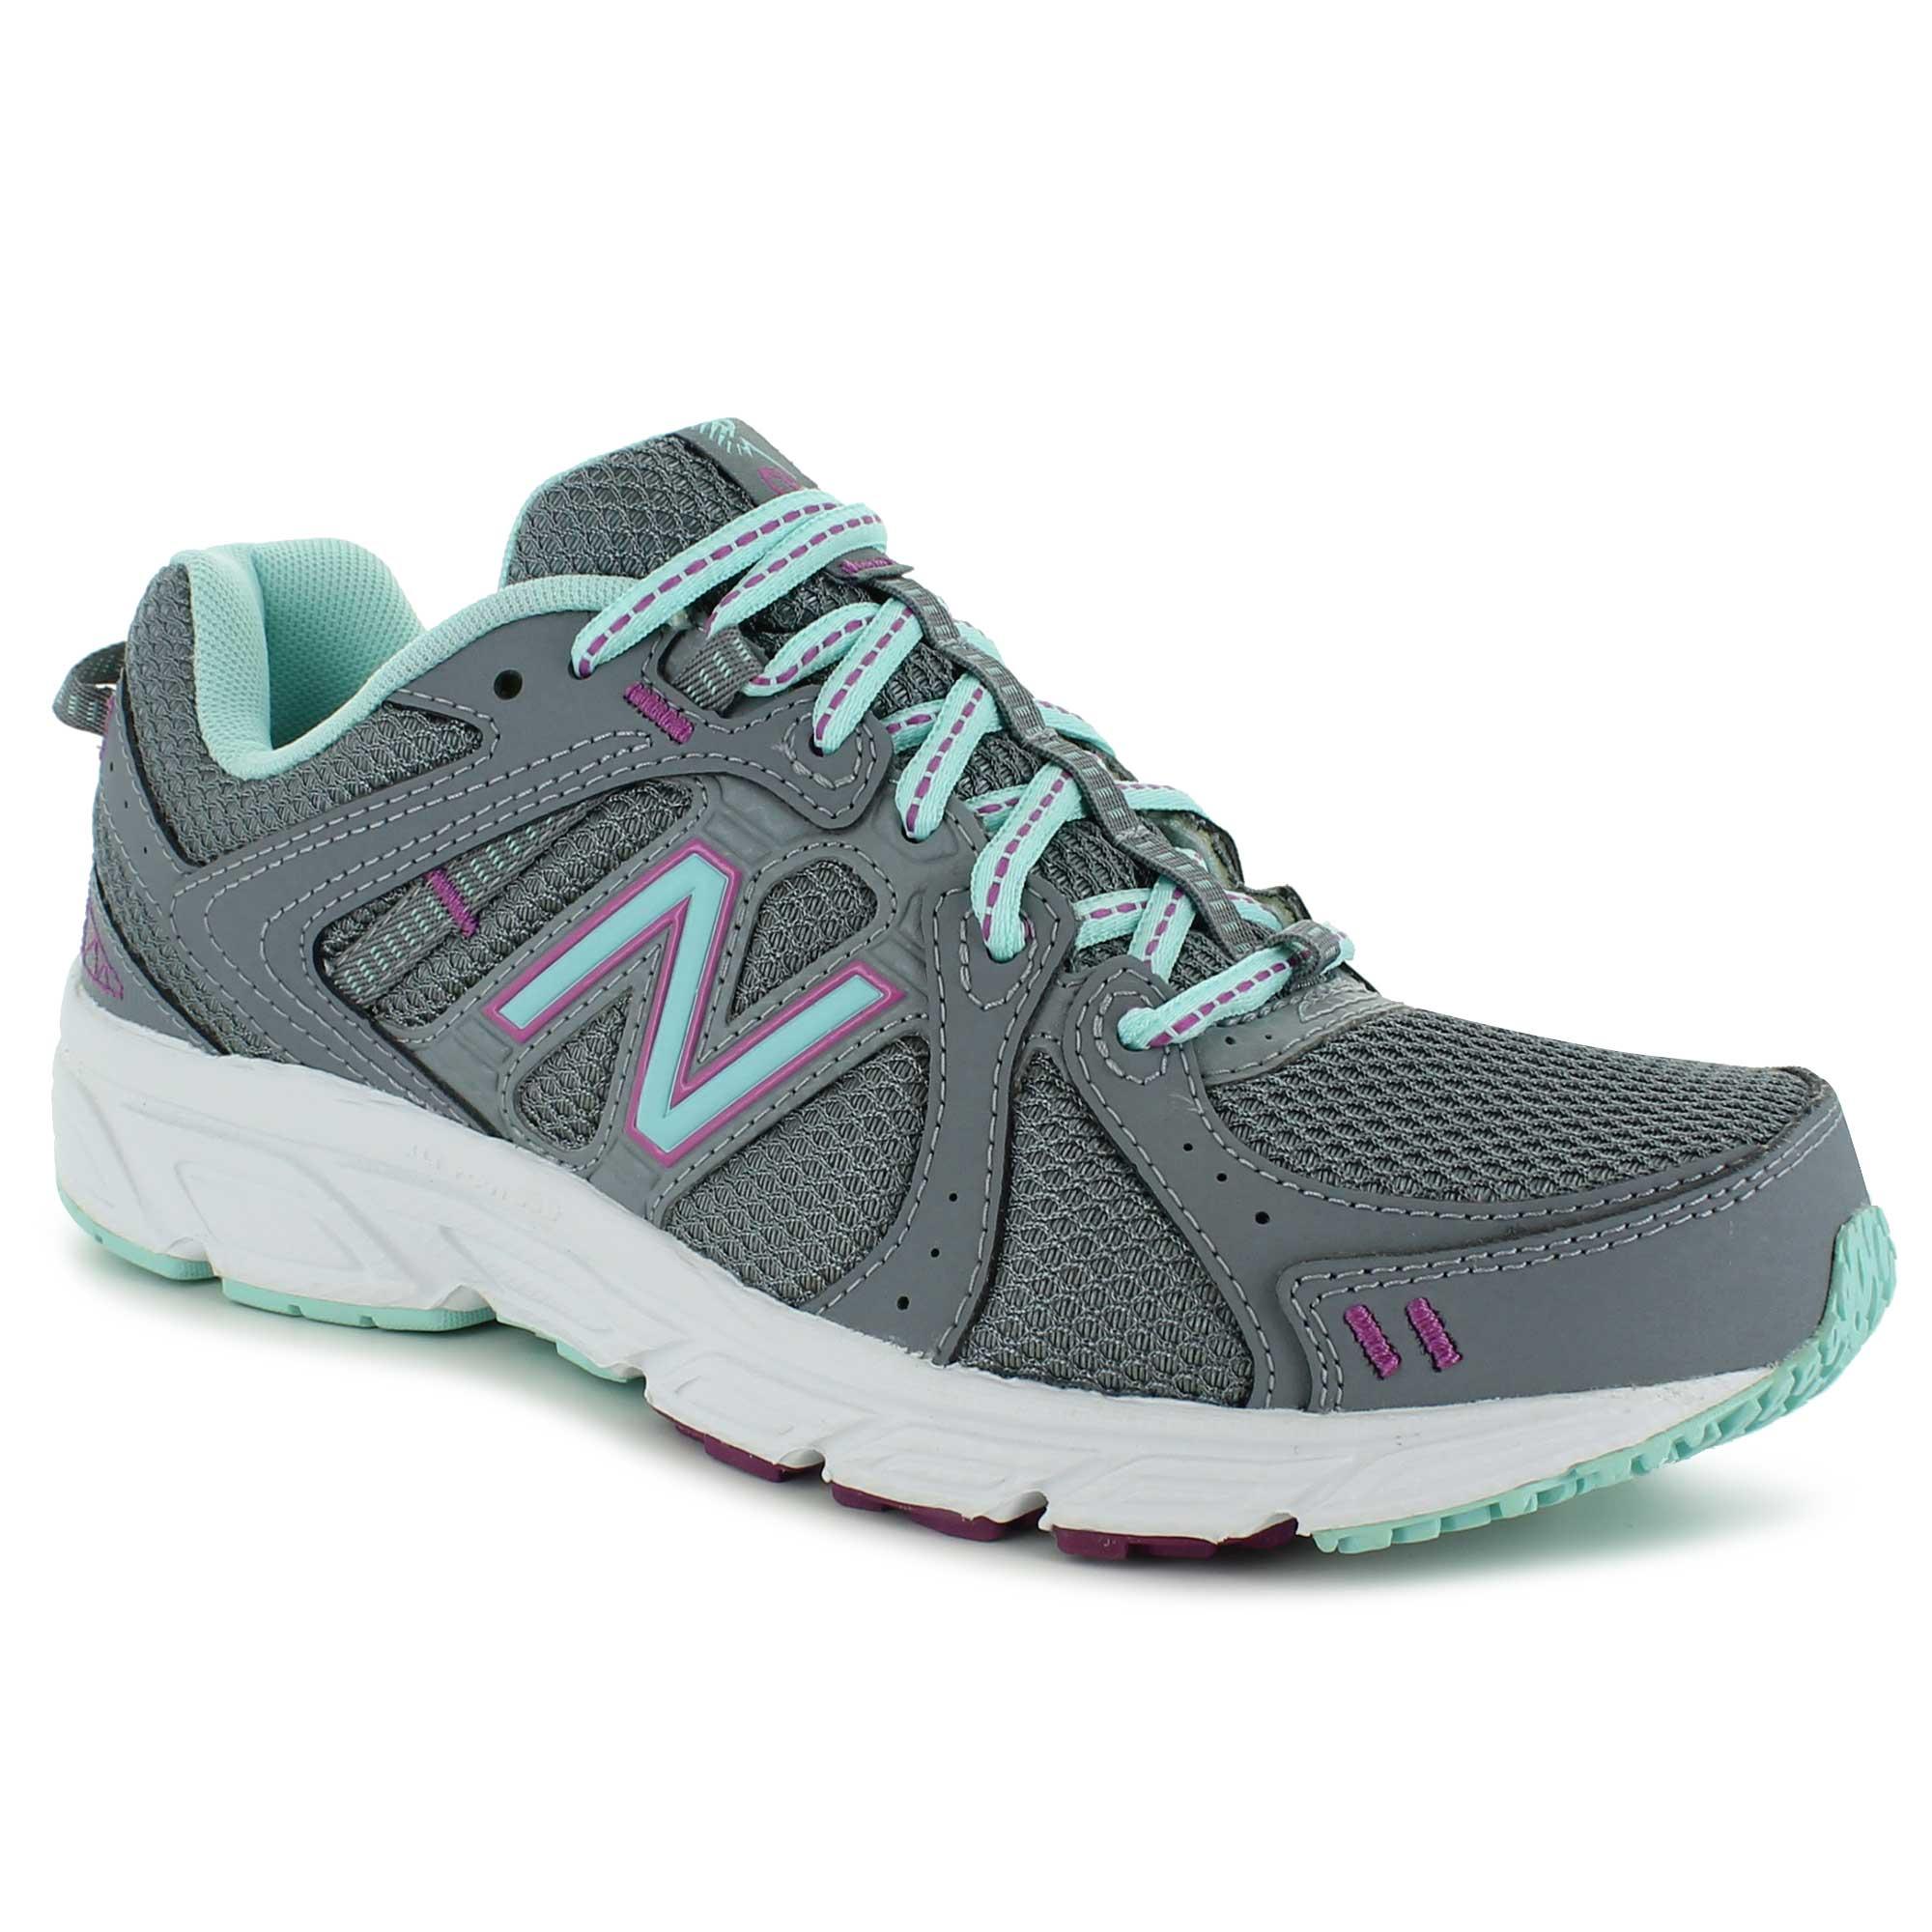 esta ahí dolor Ganar control  جوهرة لنا بيانو new balance 402 women's running shoes -  natural-soap-directory.org